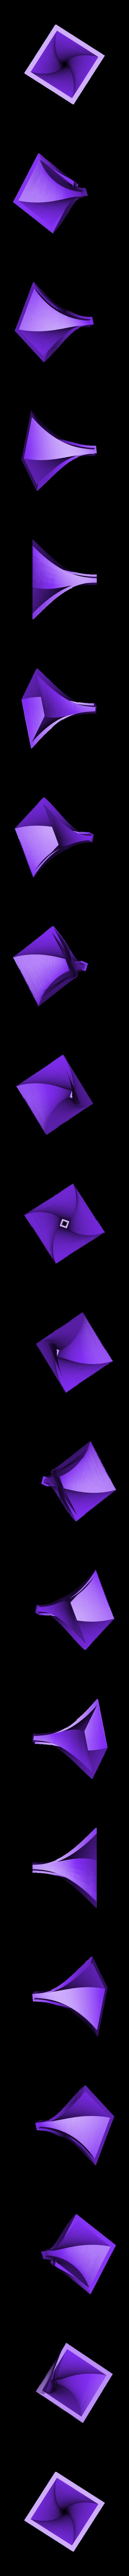 Funnel.stl Download free STL file Misc - Minimal Funnel • Model to 3D print, DoloresSegura